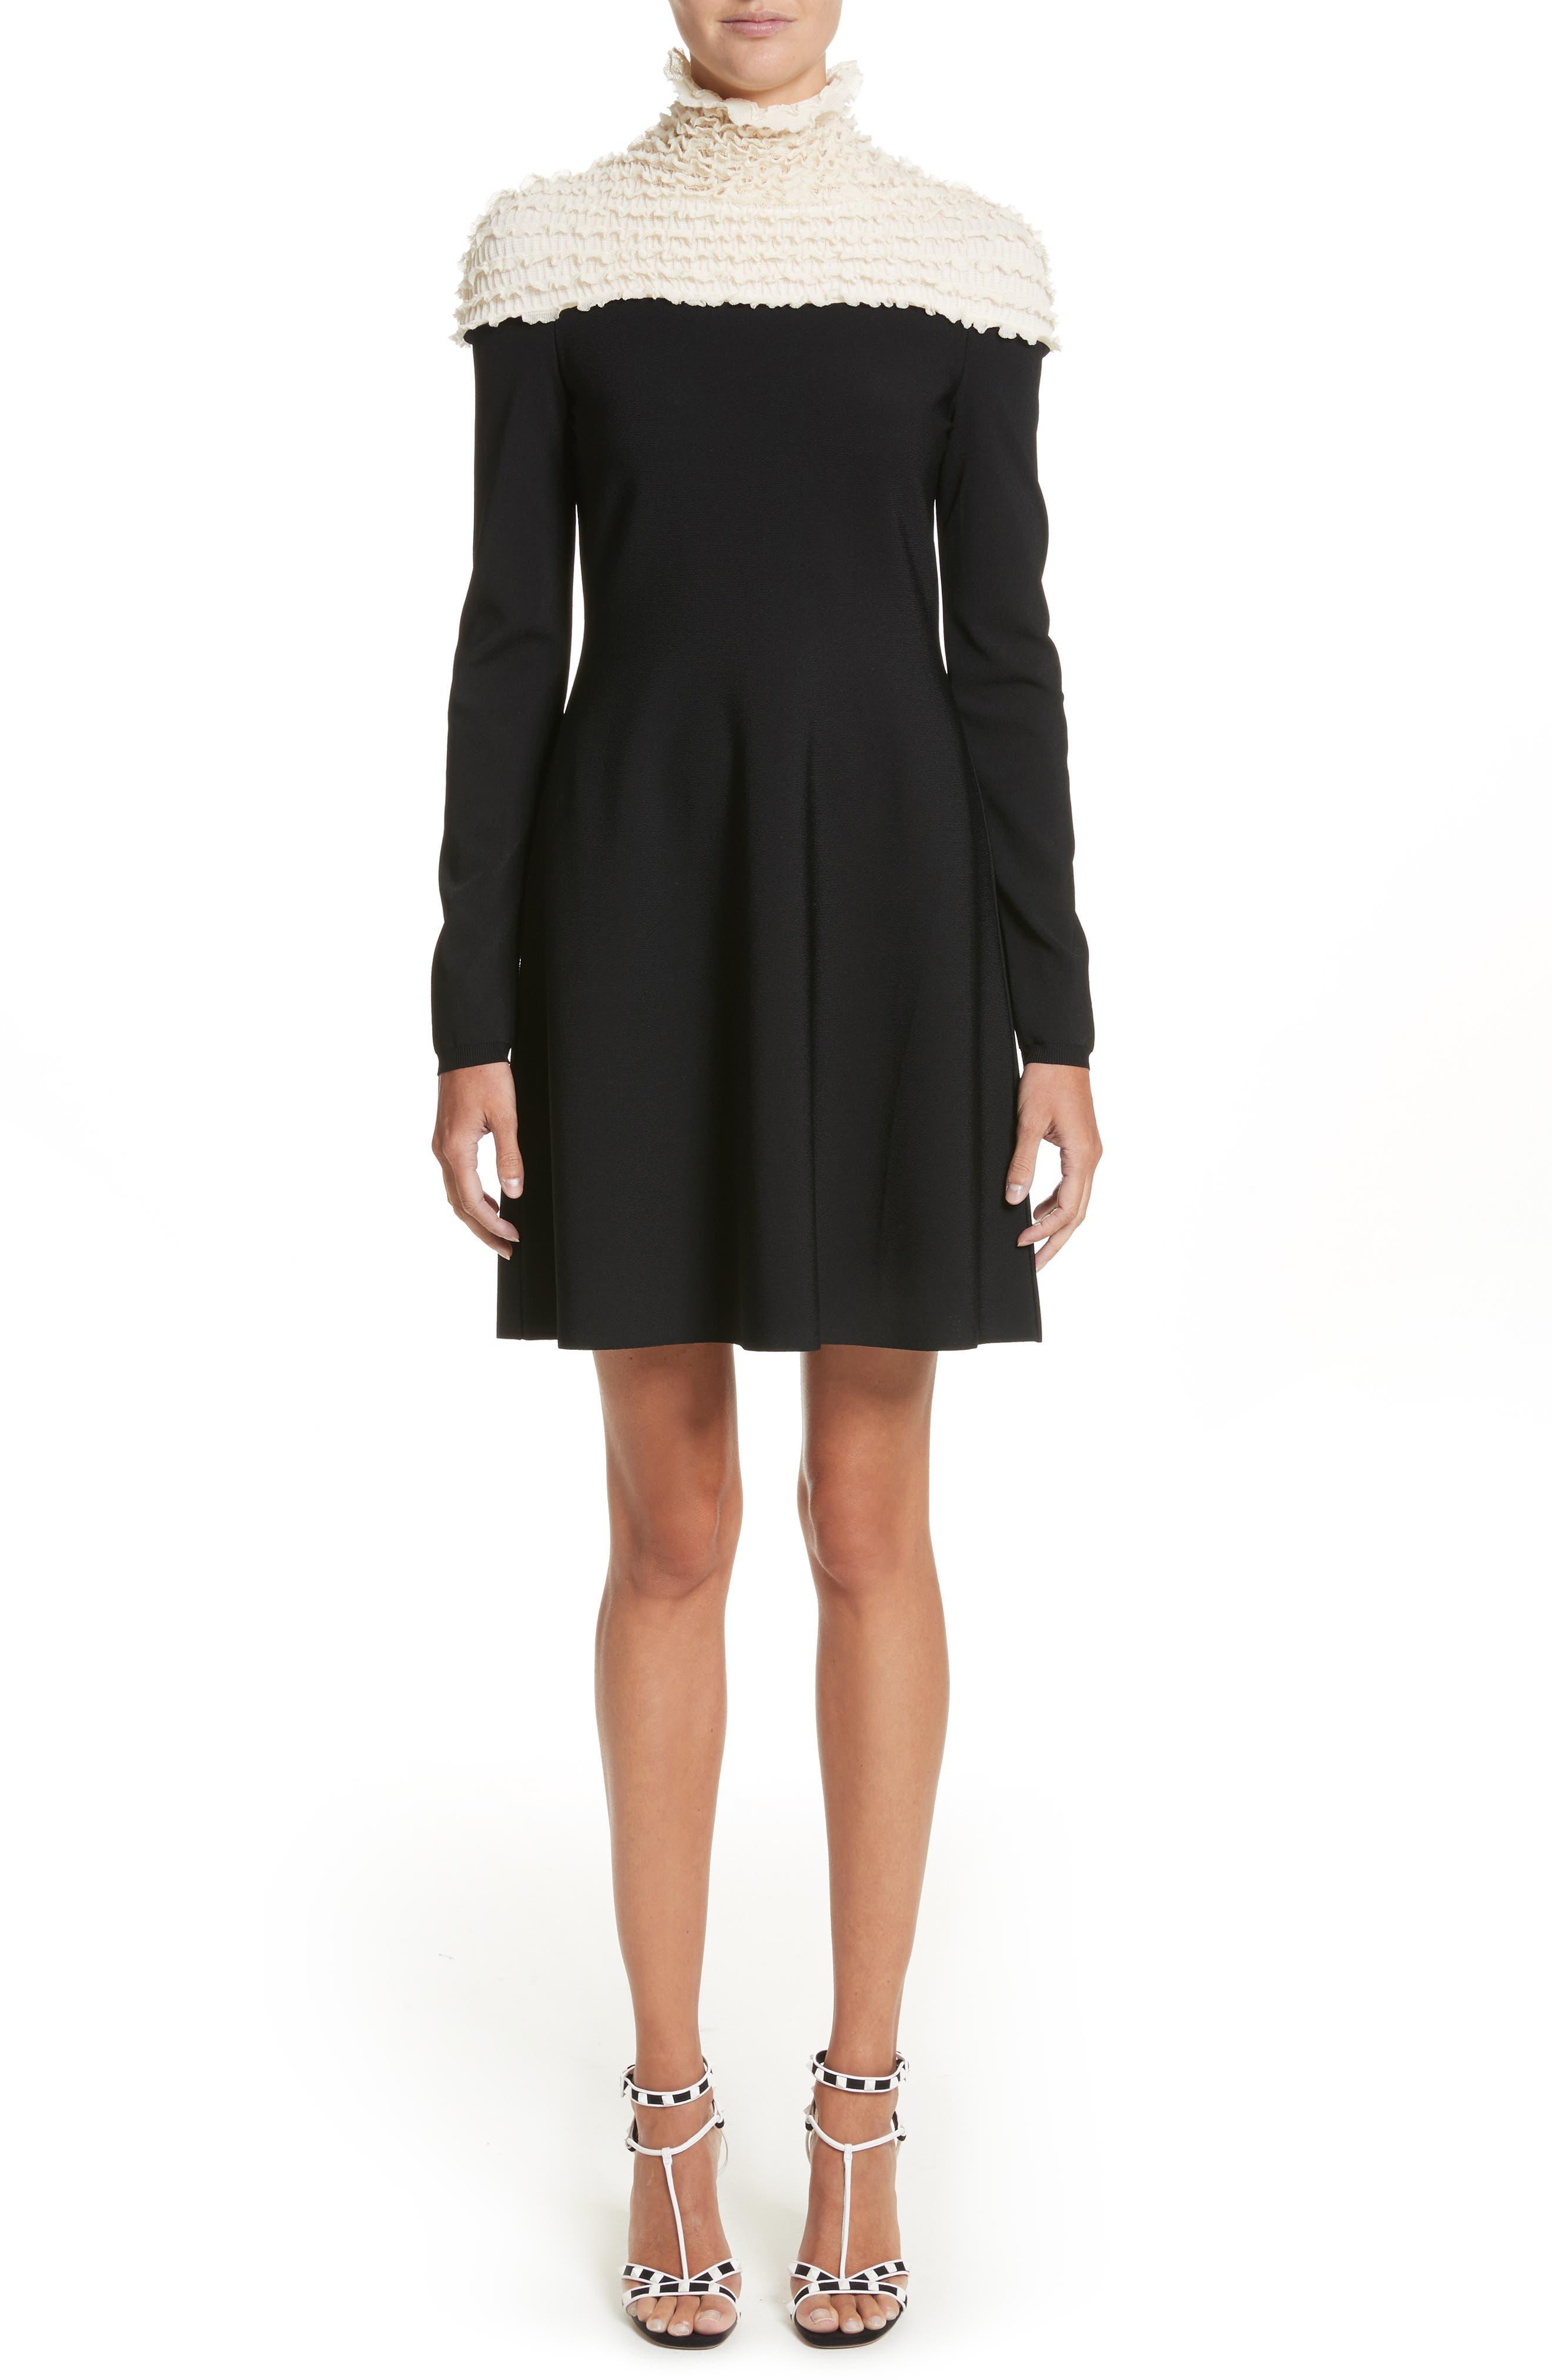 Alternate Image 1 Selected - Valentino Ruffle Neckline Knit Dress